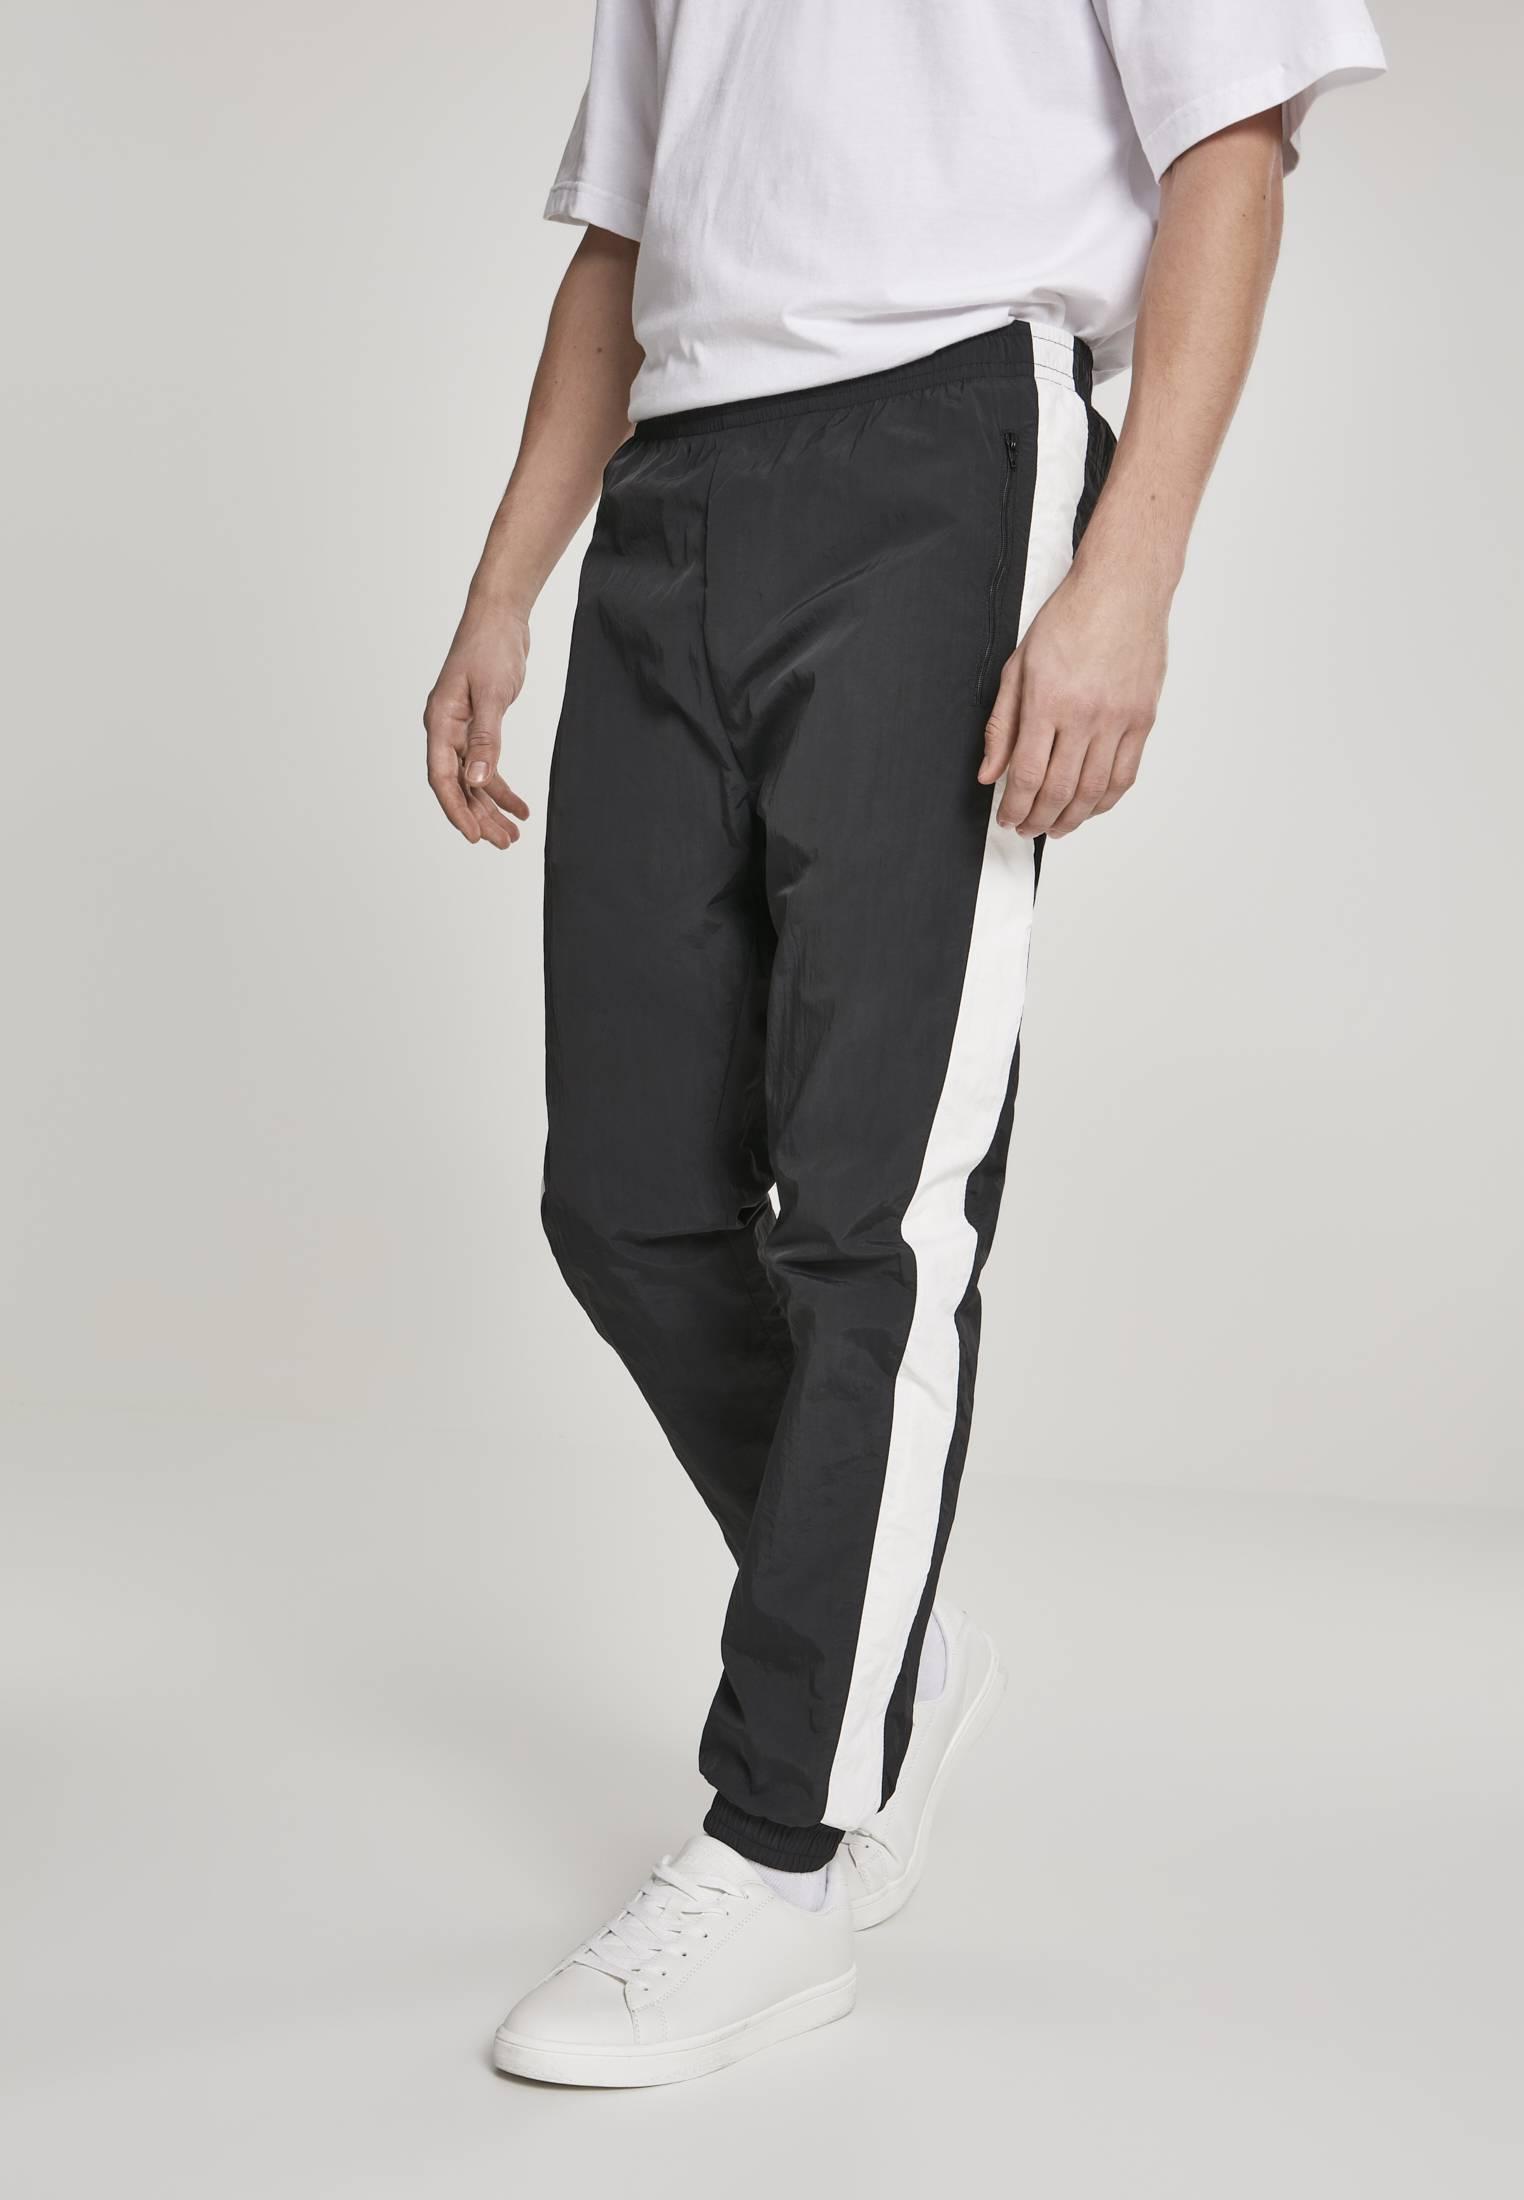 Urban Classics Side Striped Crinkle Track Pants blk/wht - XXL